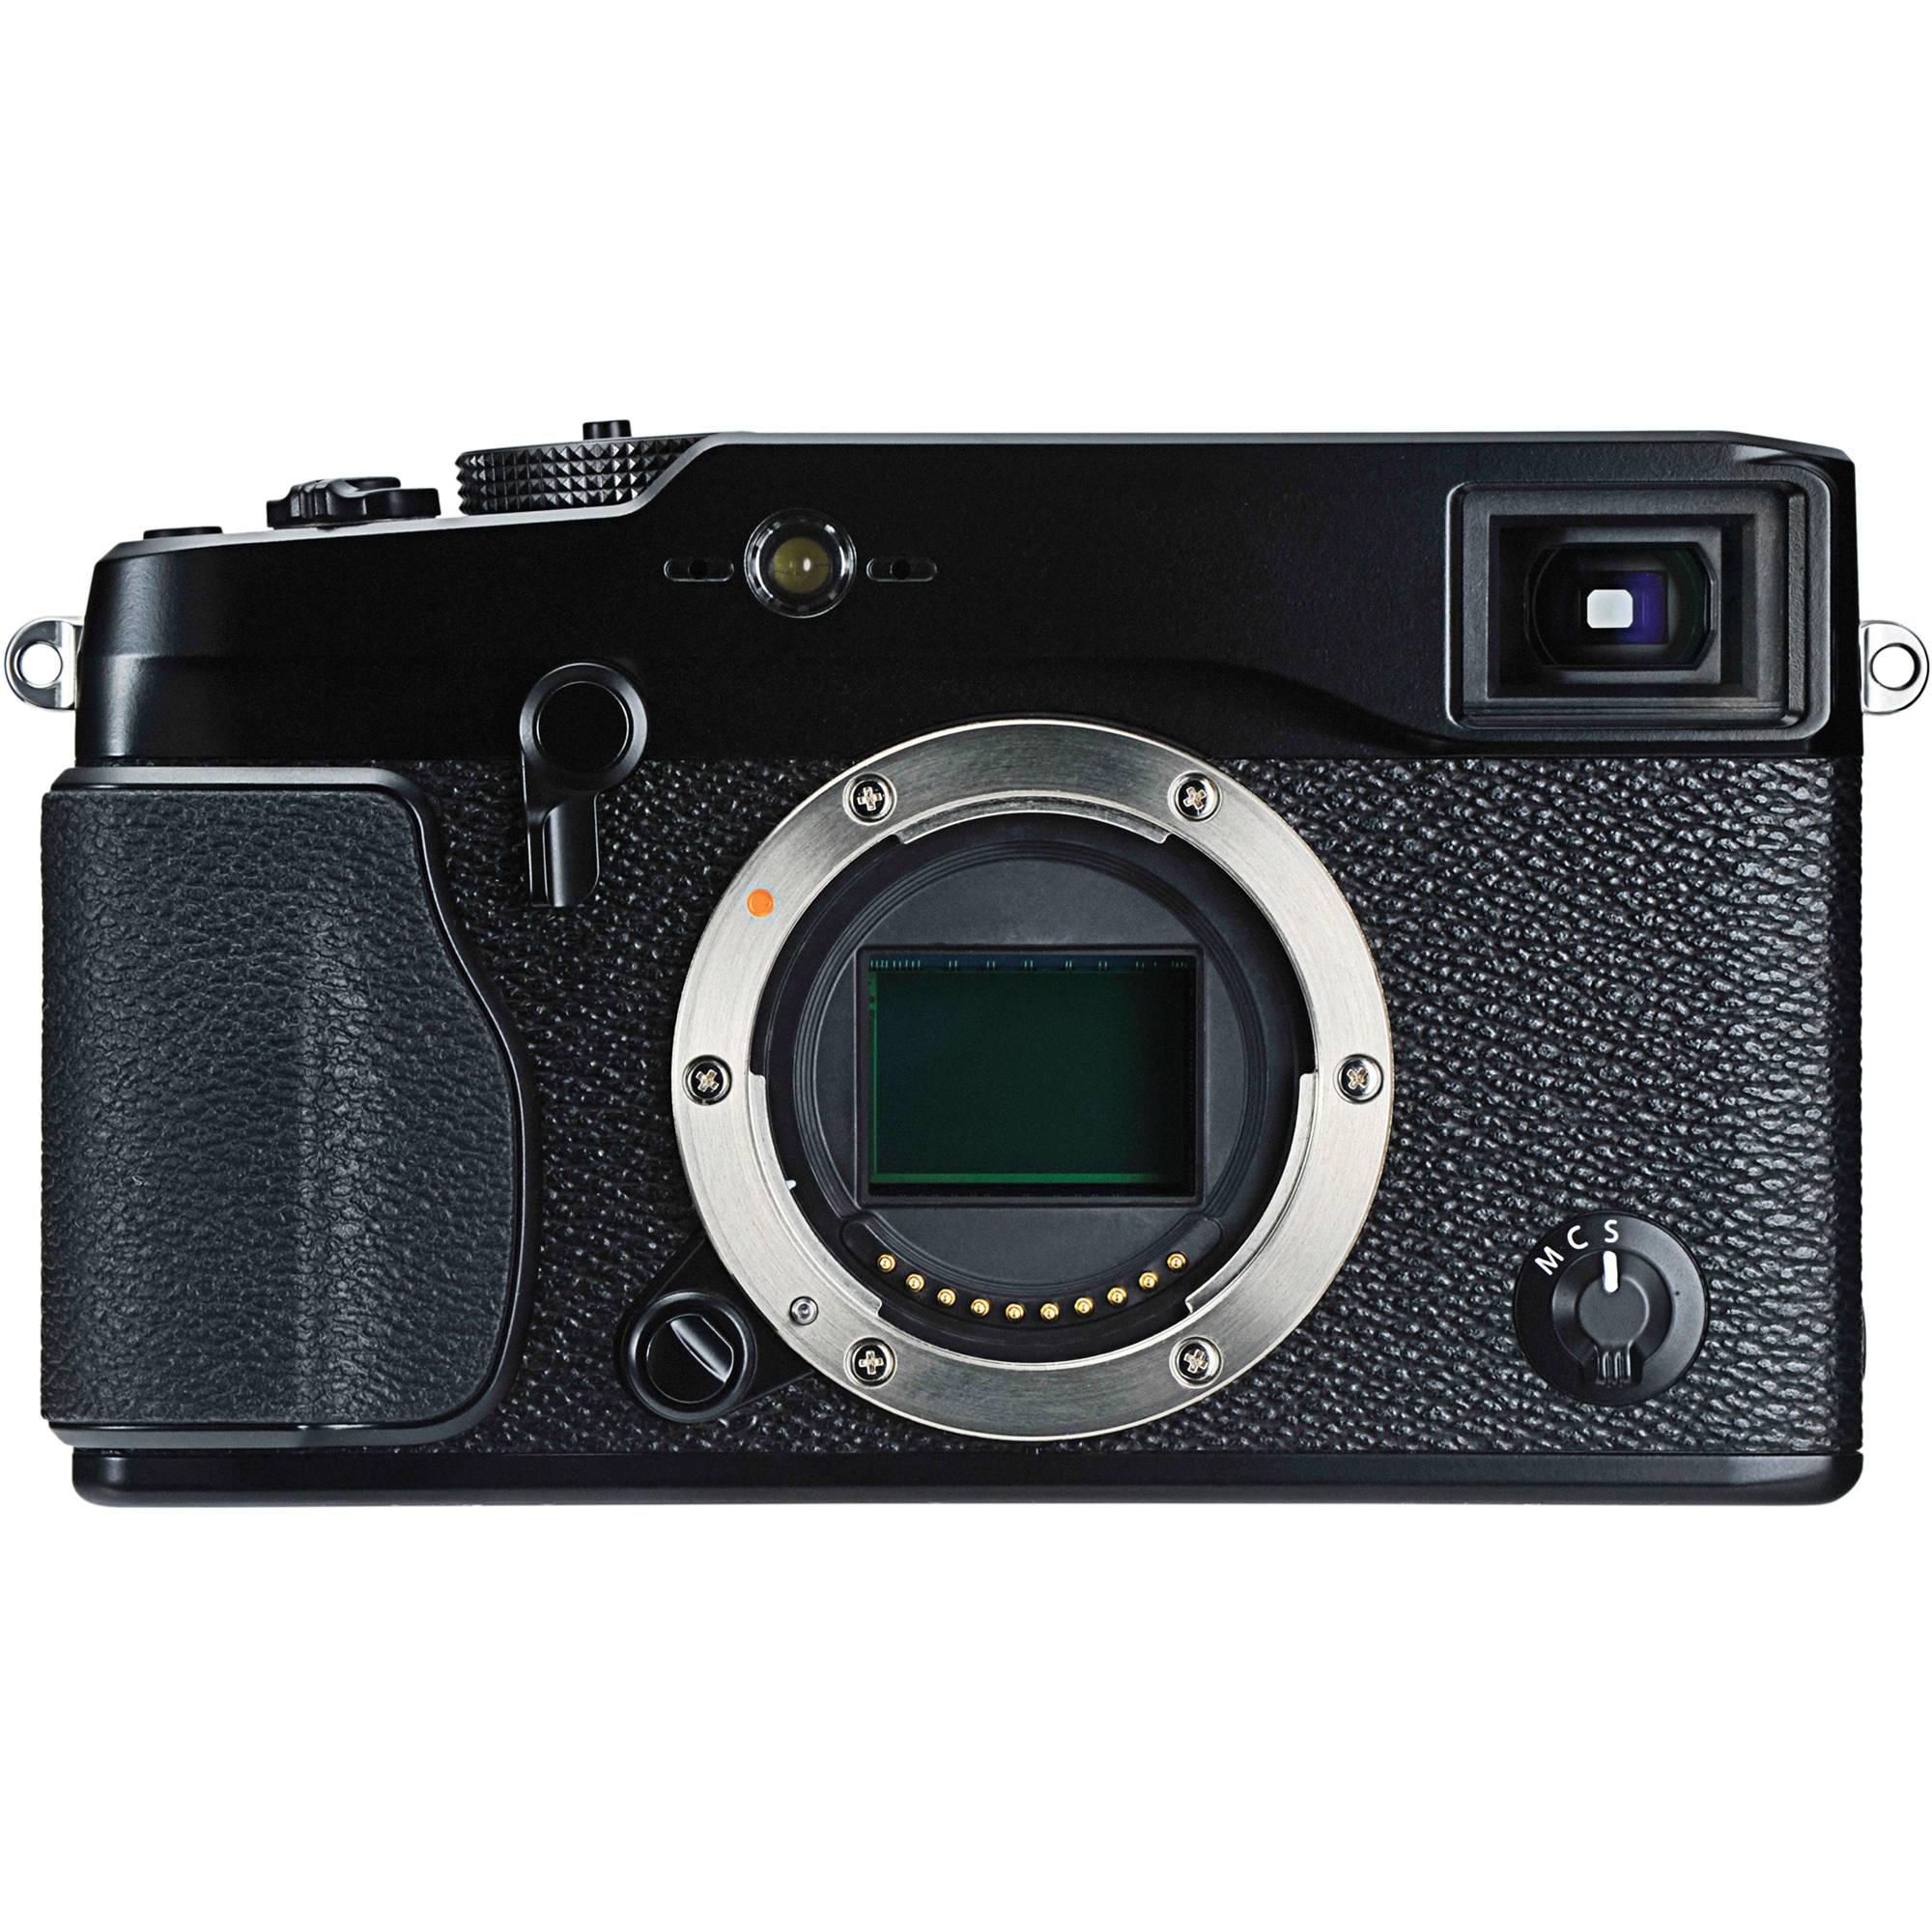 fujifilm x pro1 mirrorless digital camera body only 16225391. Black Bedroom Furniture Sets. Home Design Ideas